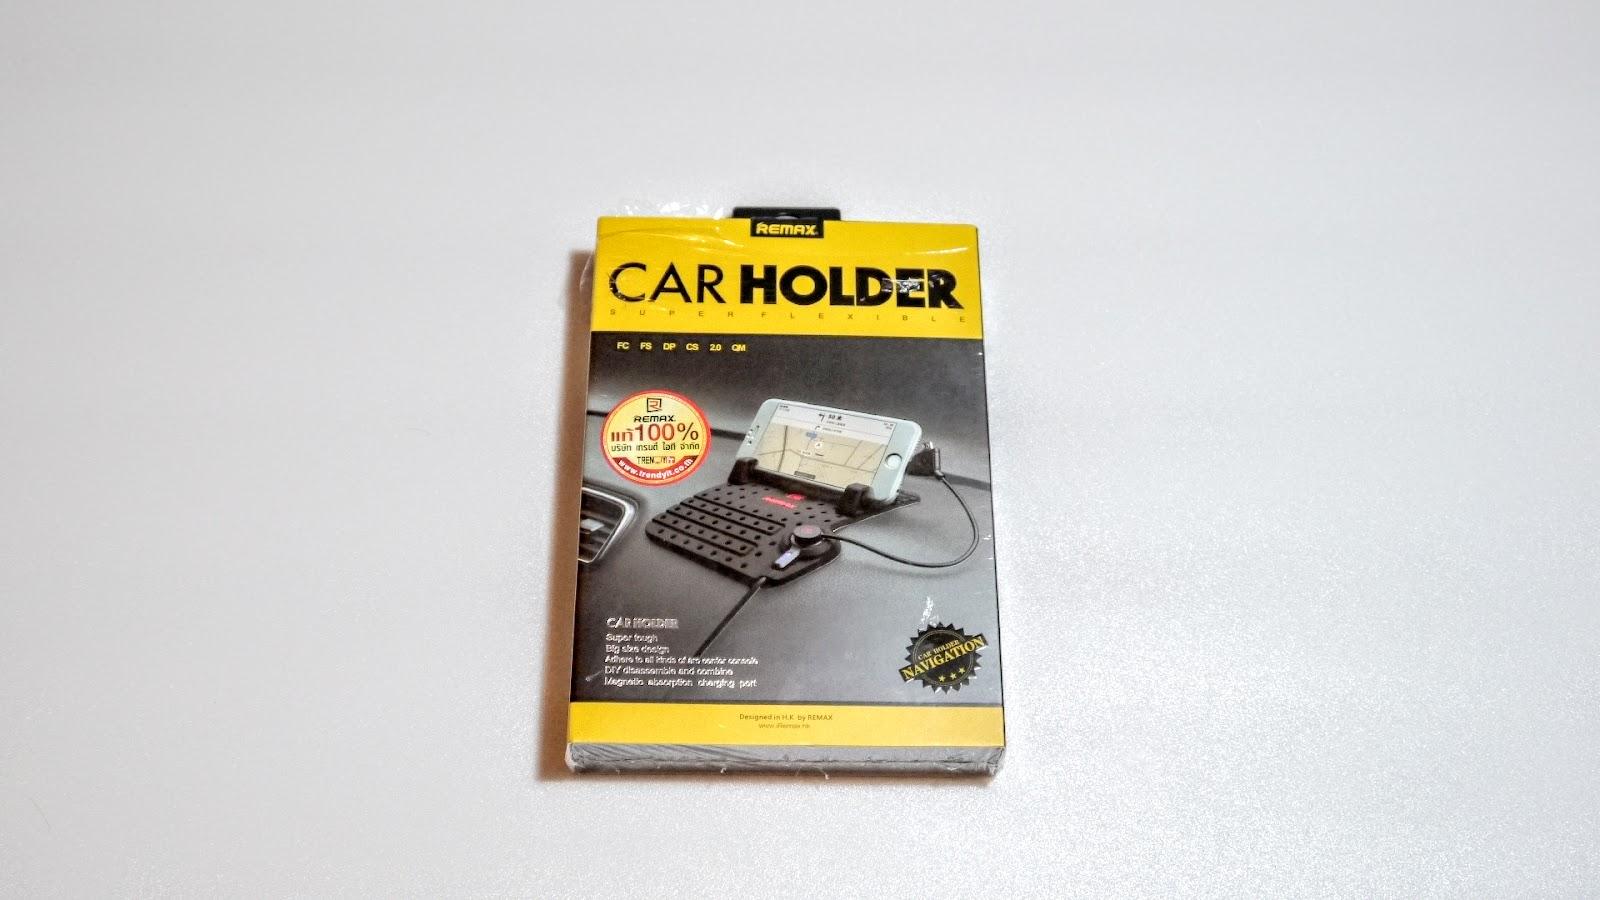 Guzap Review Remax Holder Super Flexible Car Design Carholder